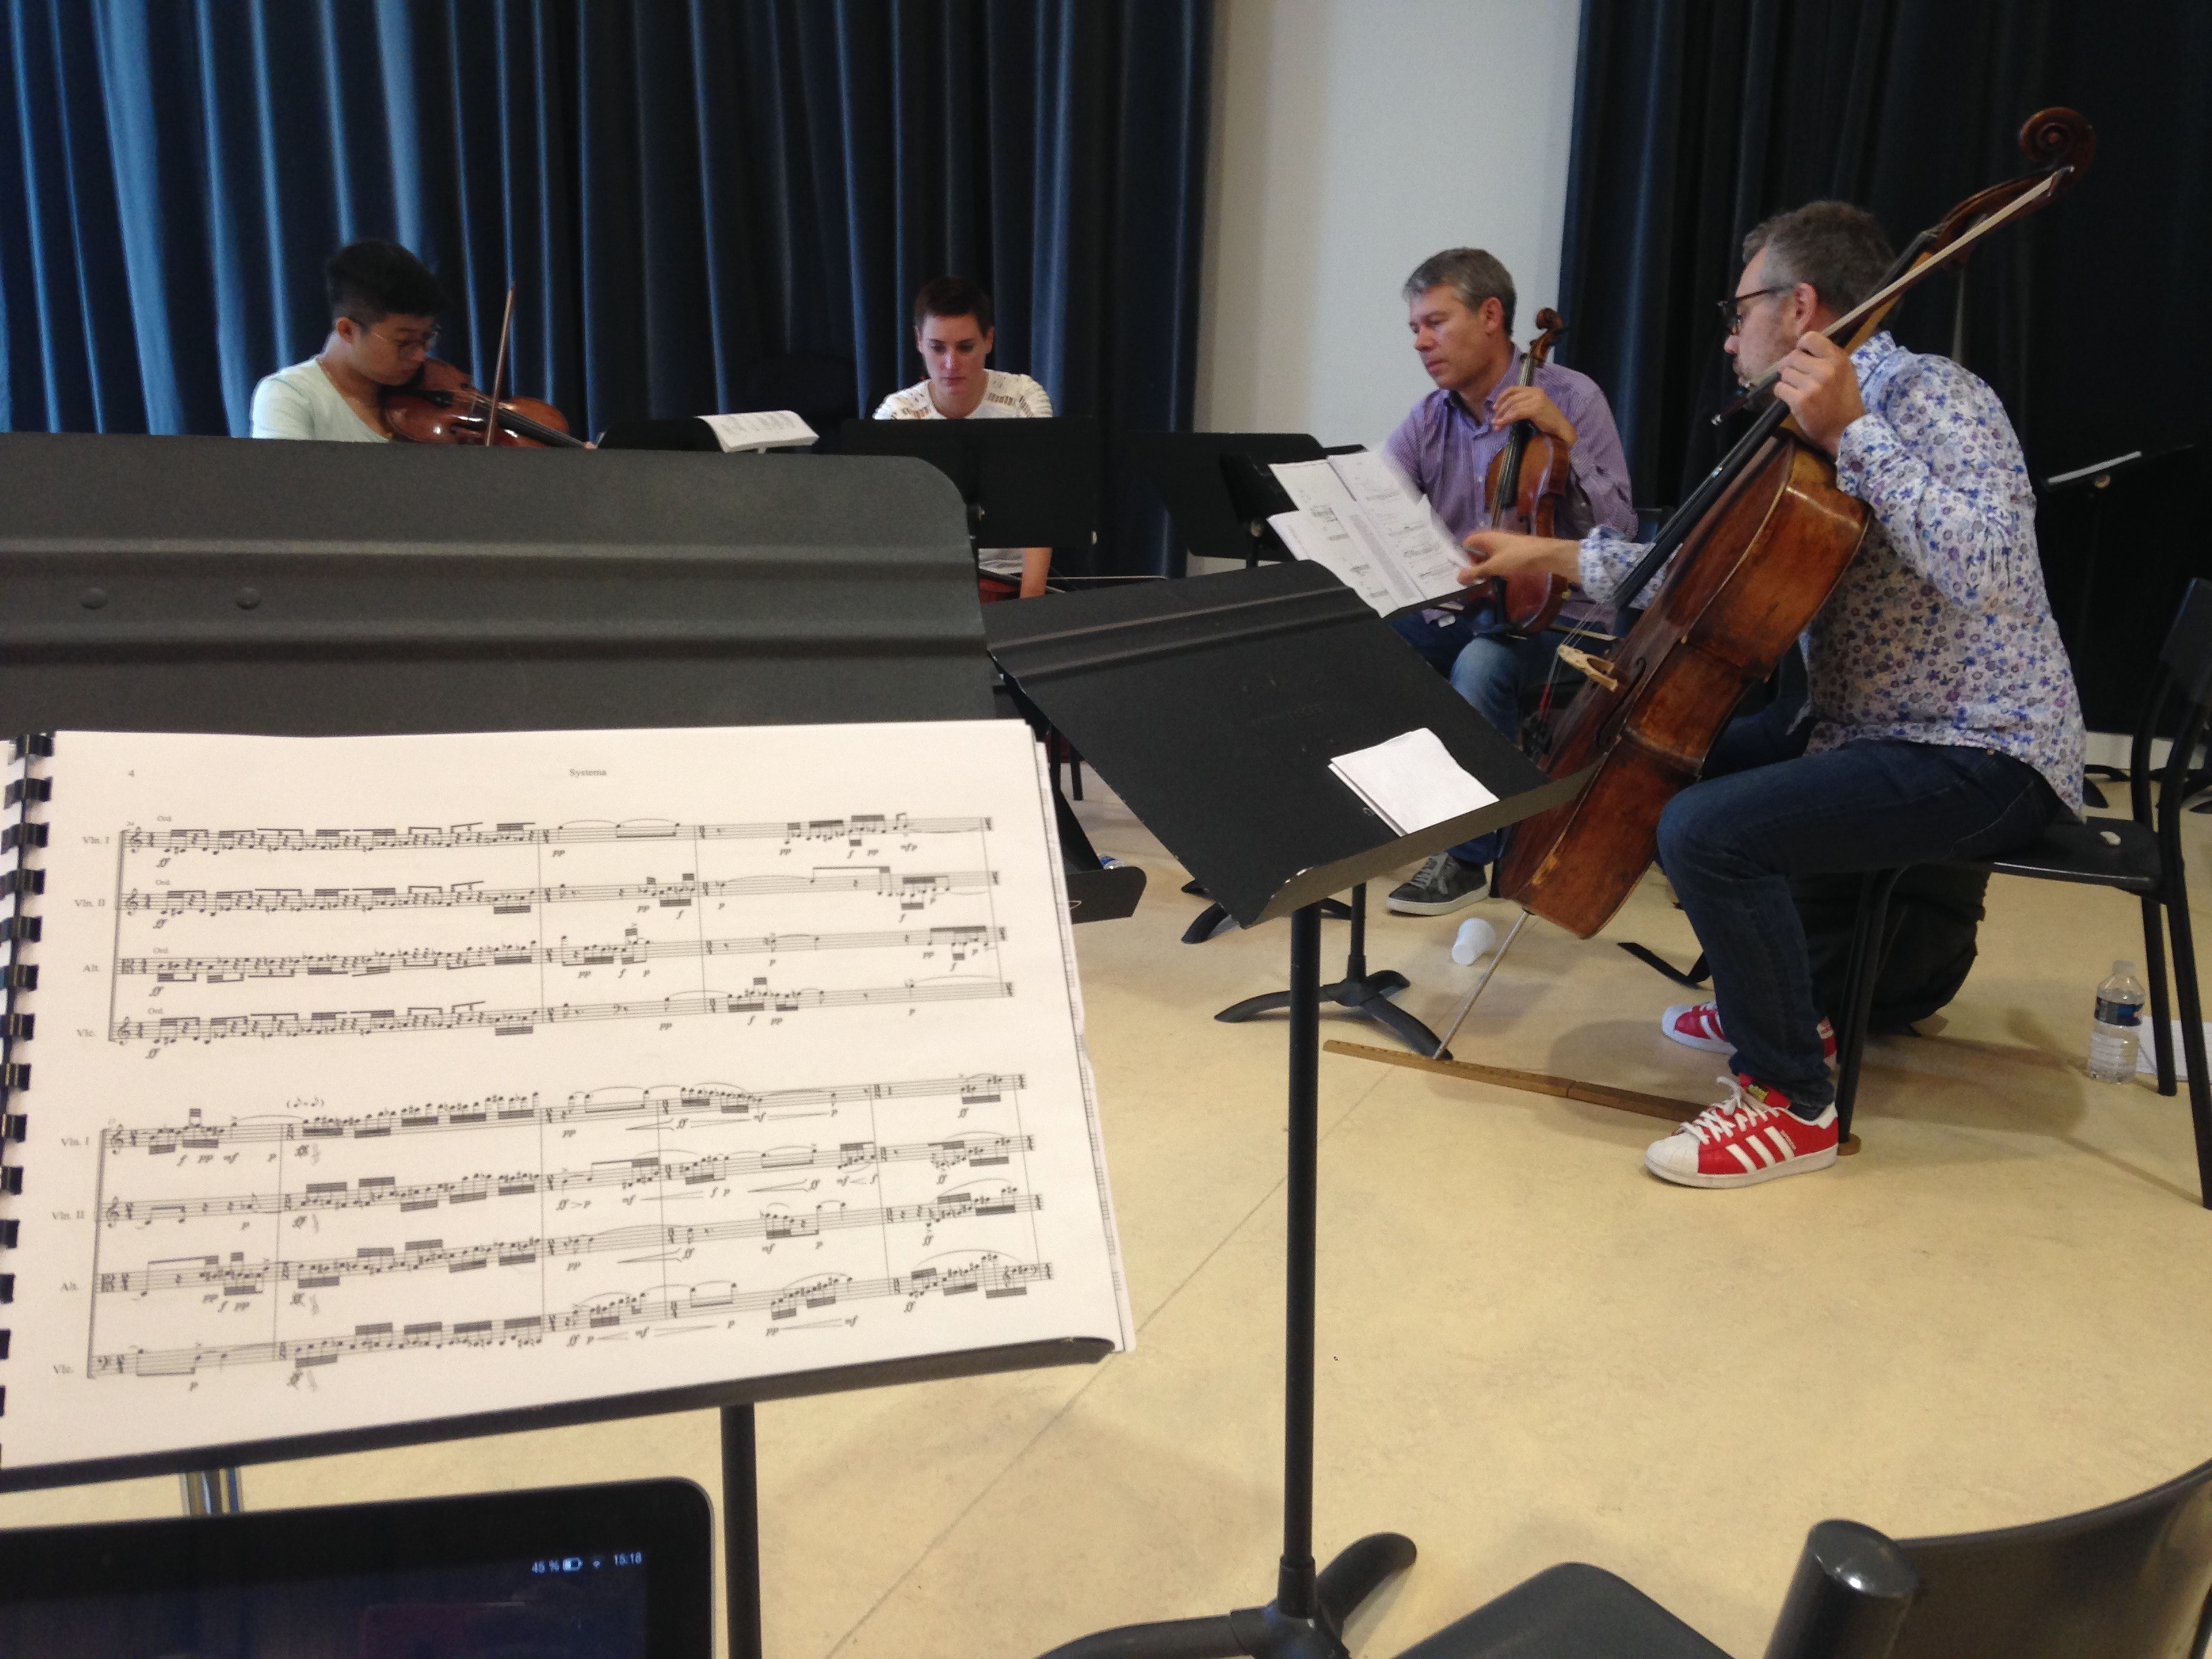 Rehearsal with Quatuor Diotima